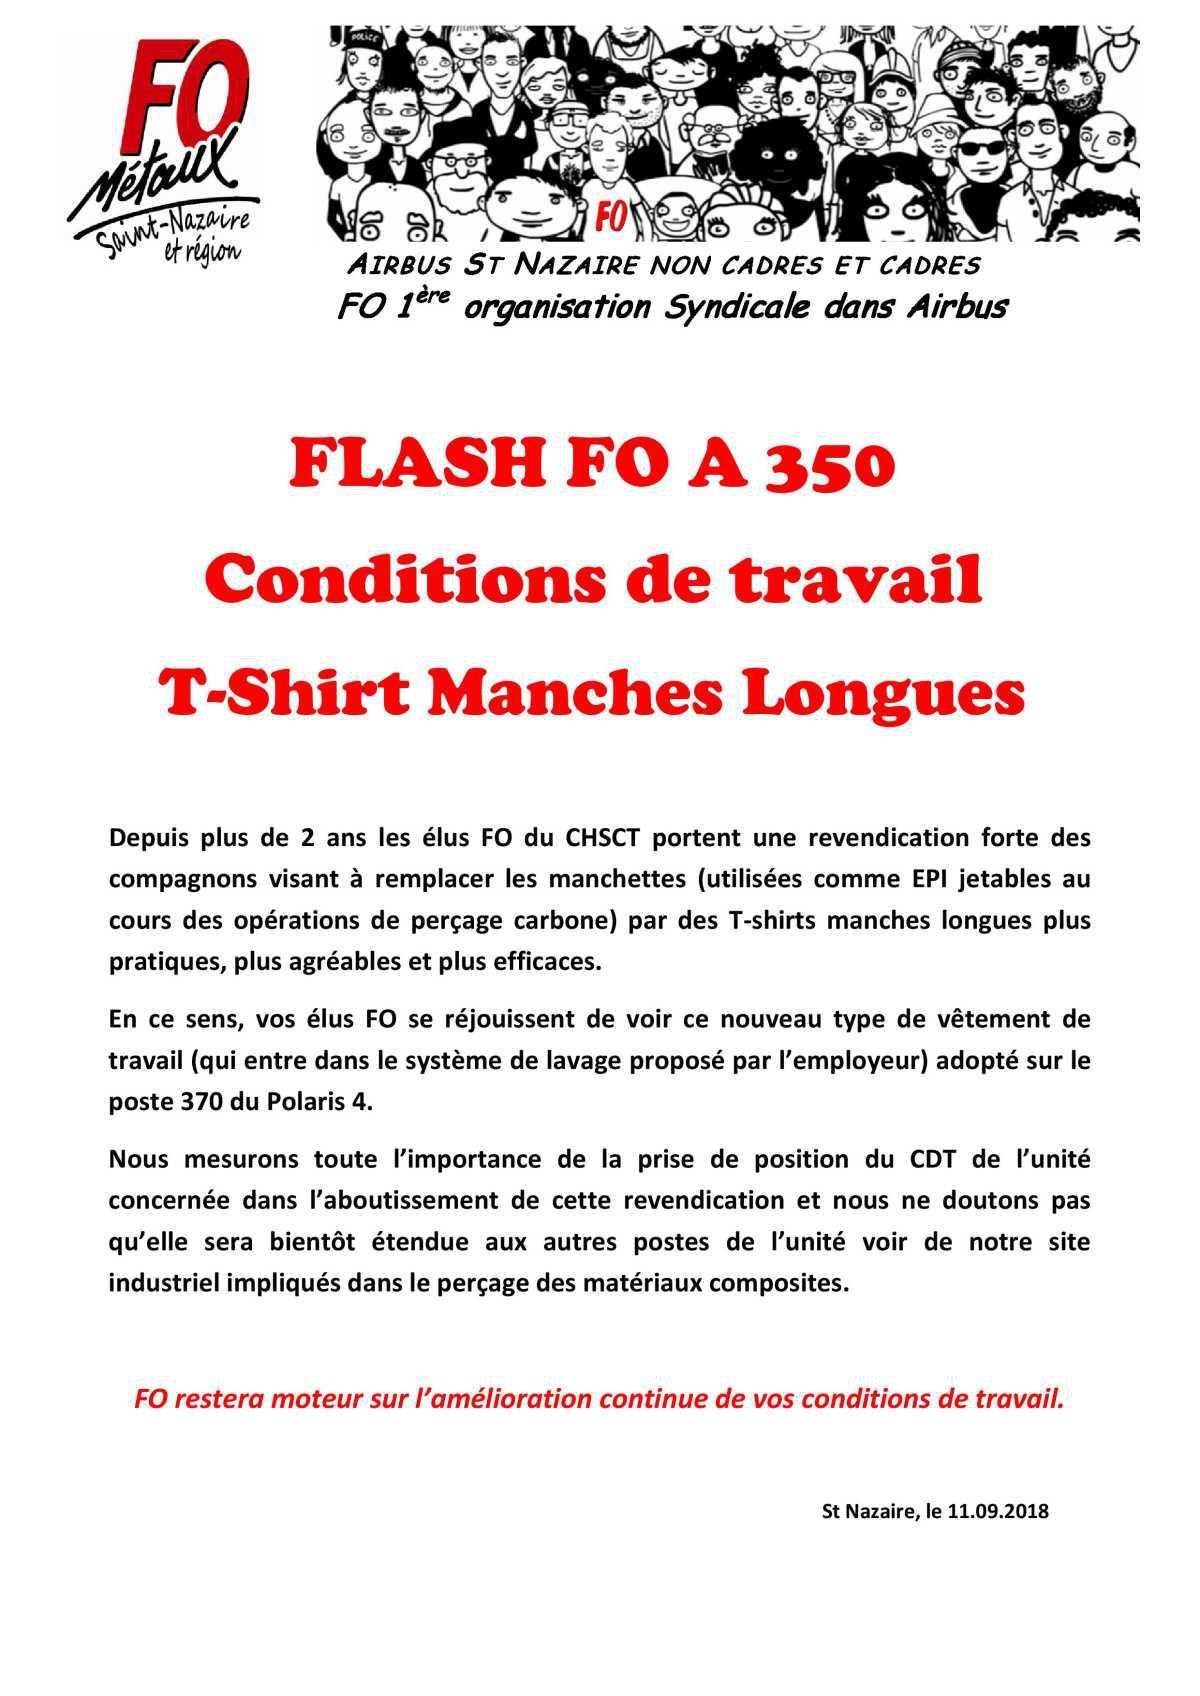 Flash T-Shirt Manches Longues